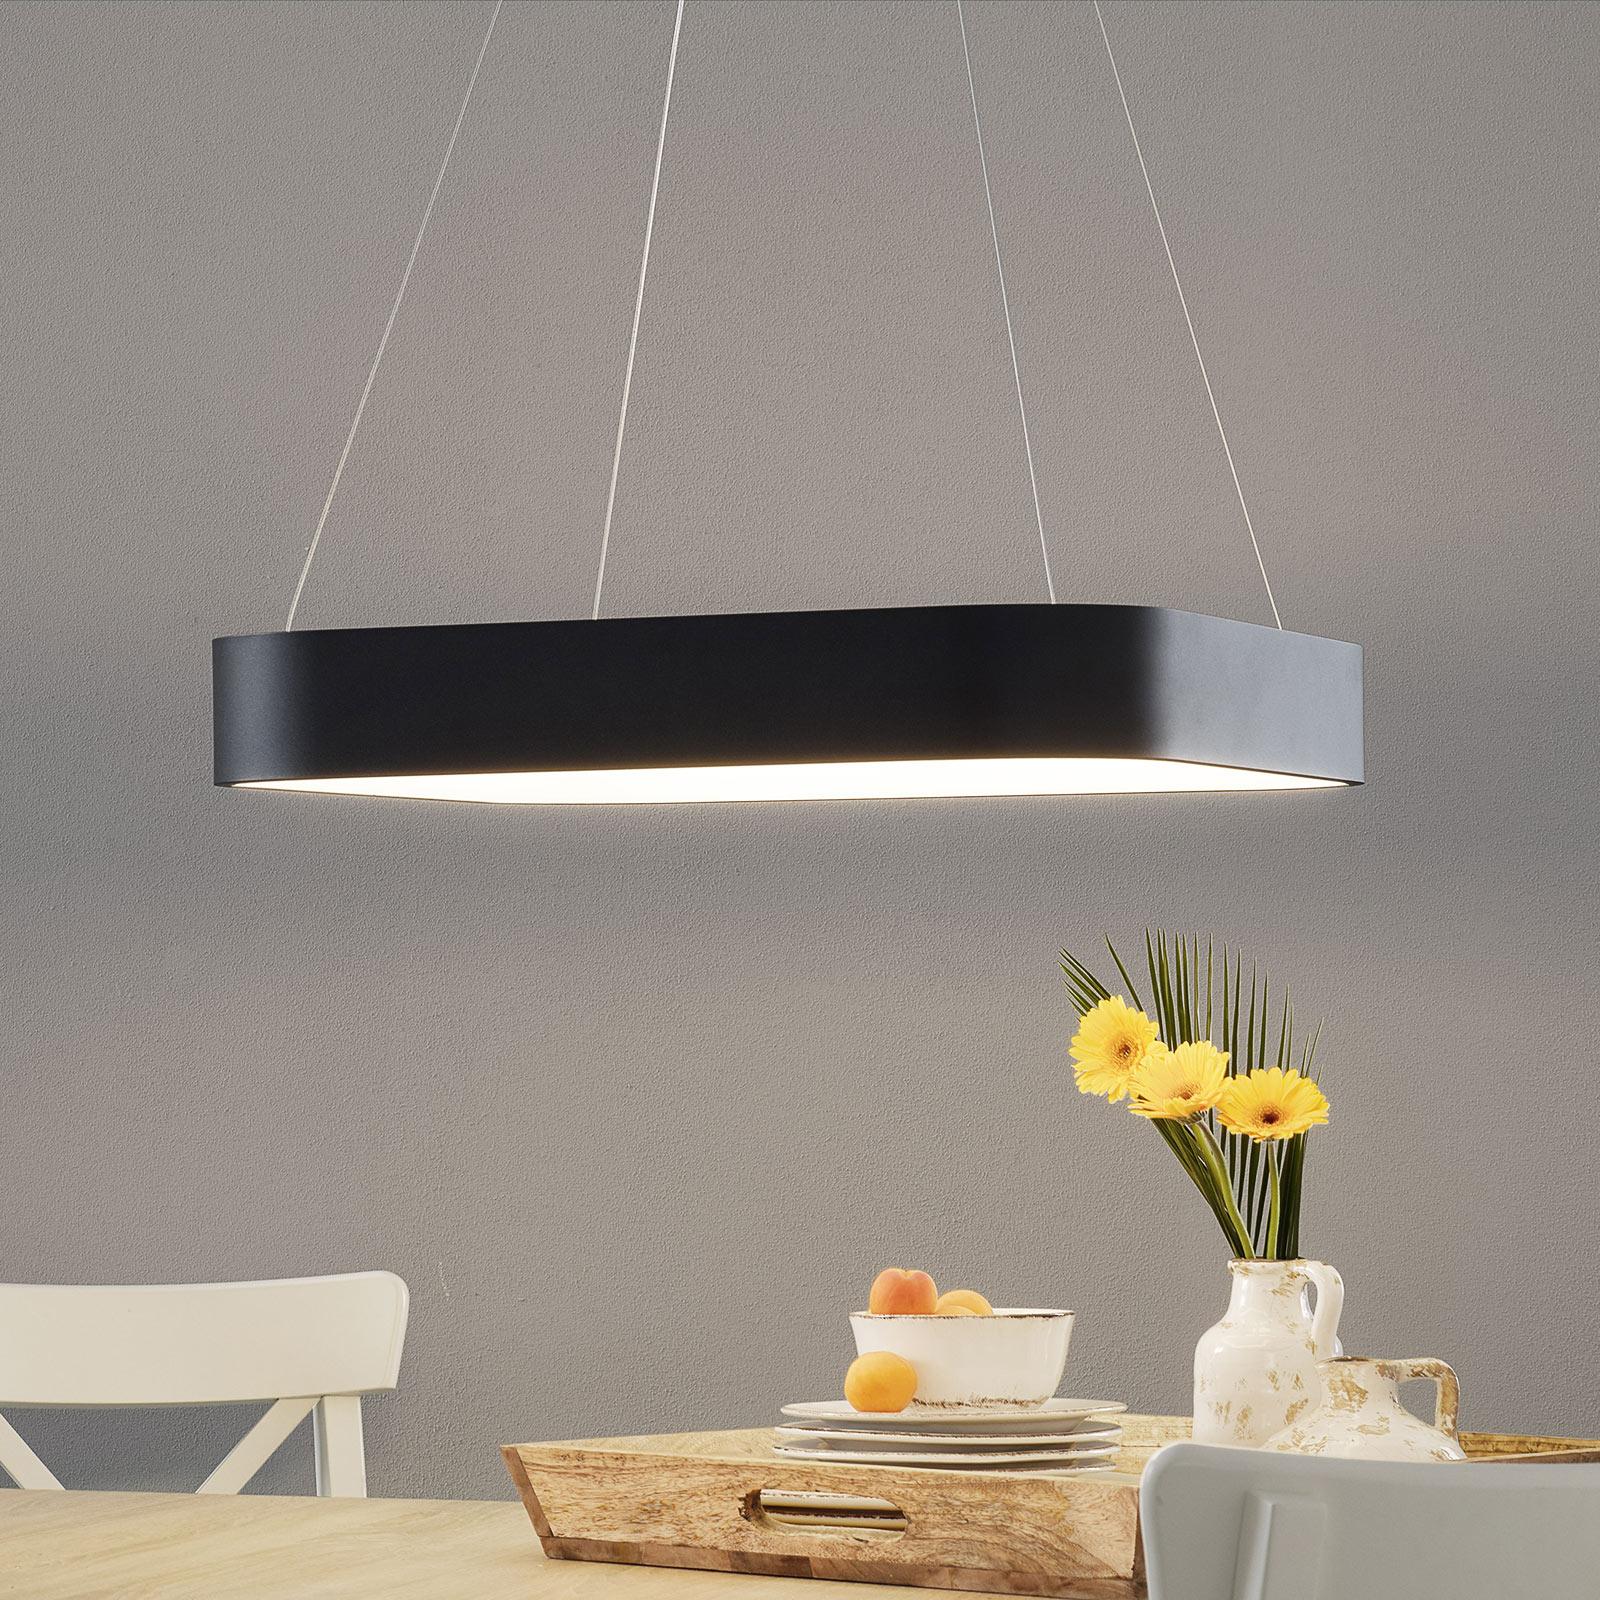 LED-riippuvalaisin Grand 60x60cm, musta